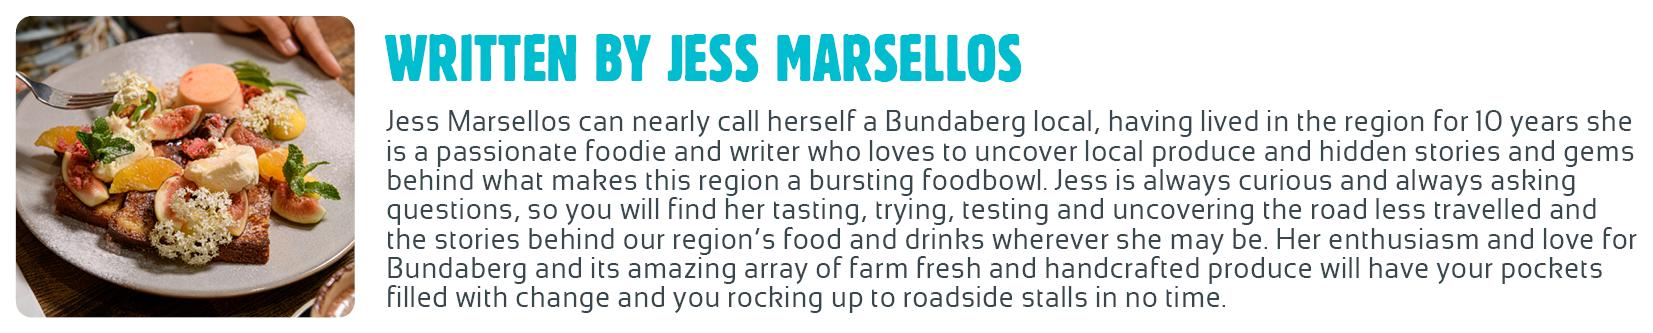 Guest Blogger Bio Jess Marsellos